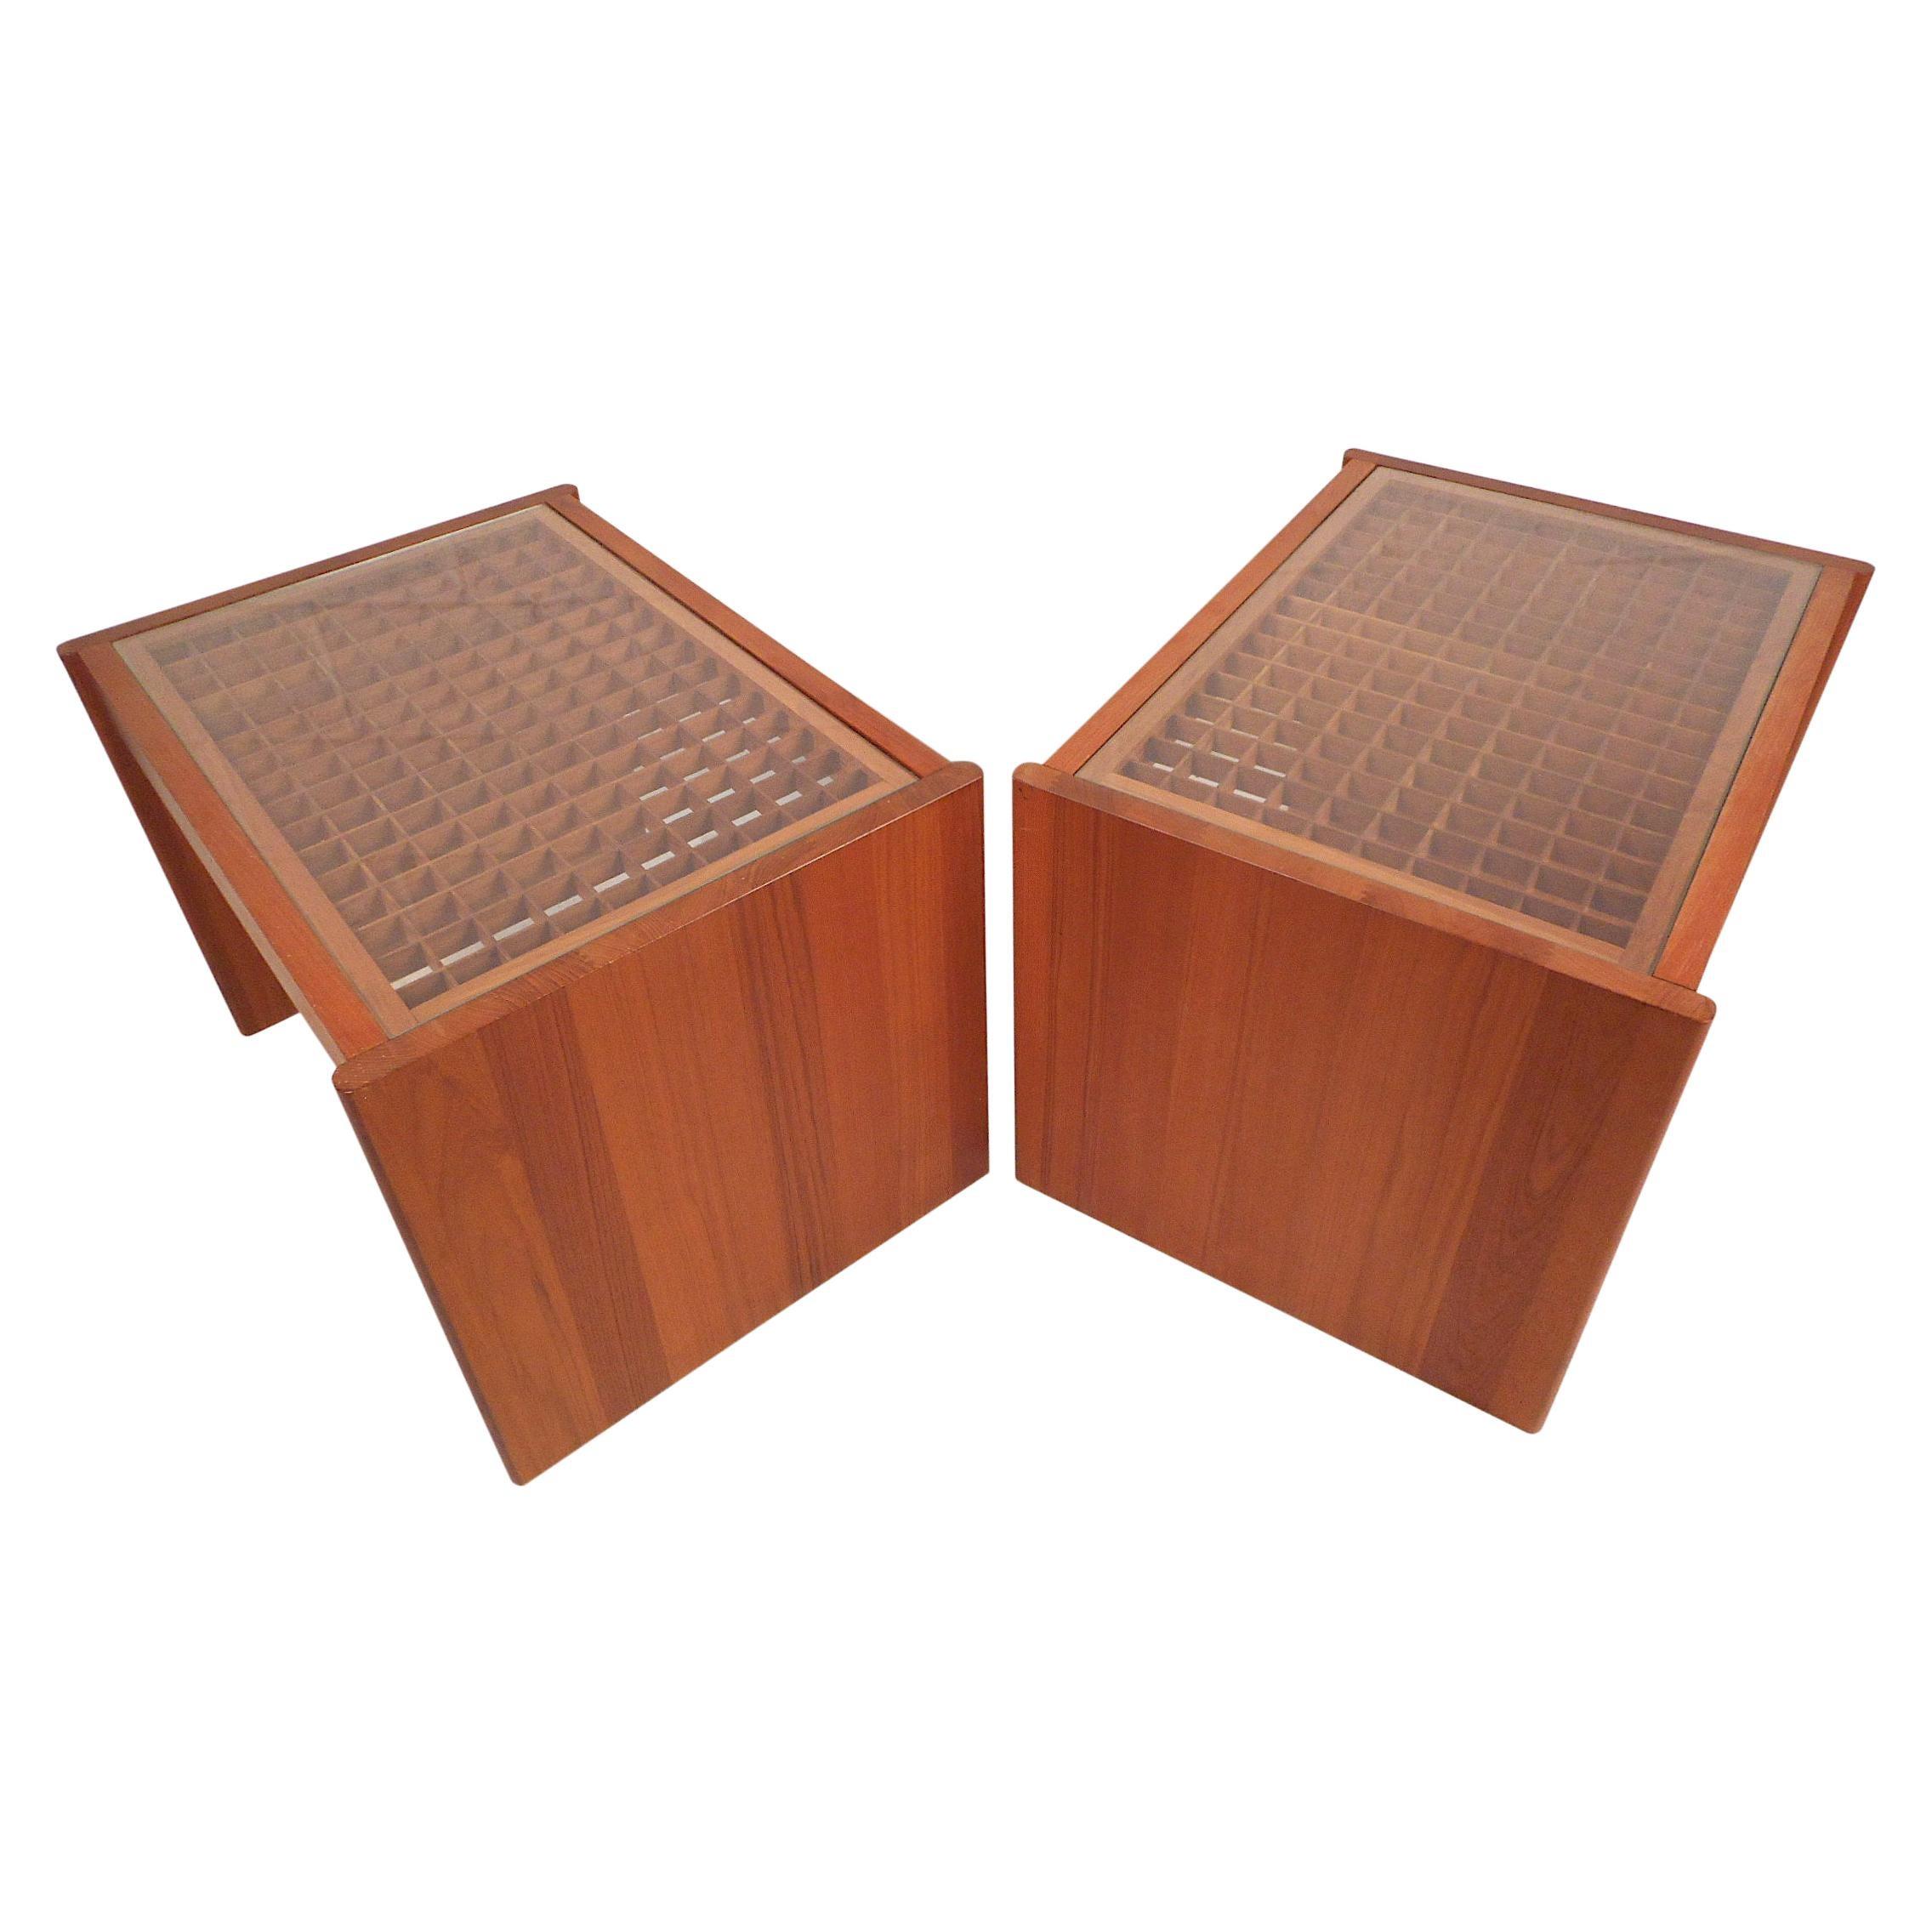 Danish Modern End Tables by Komfort